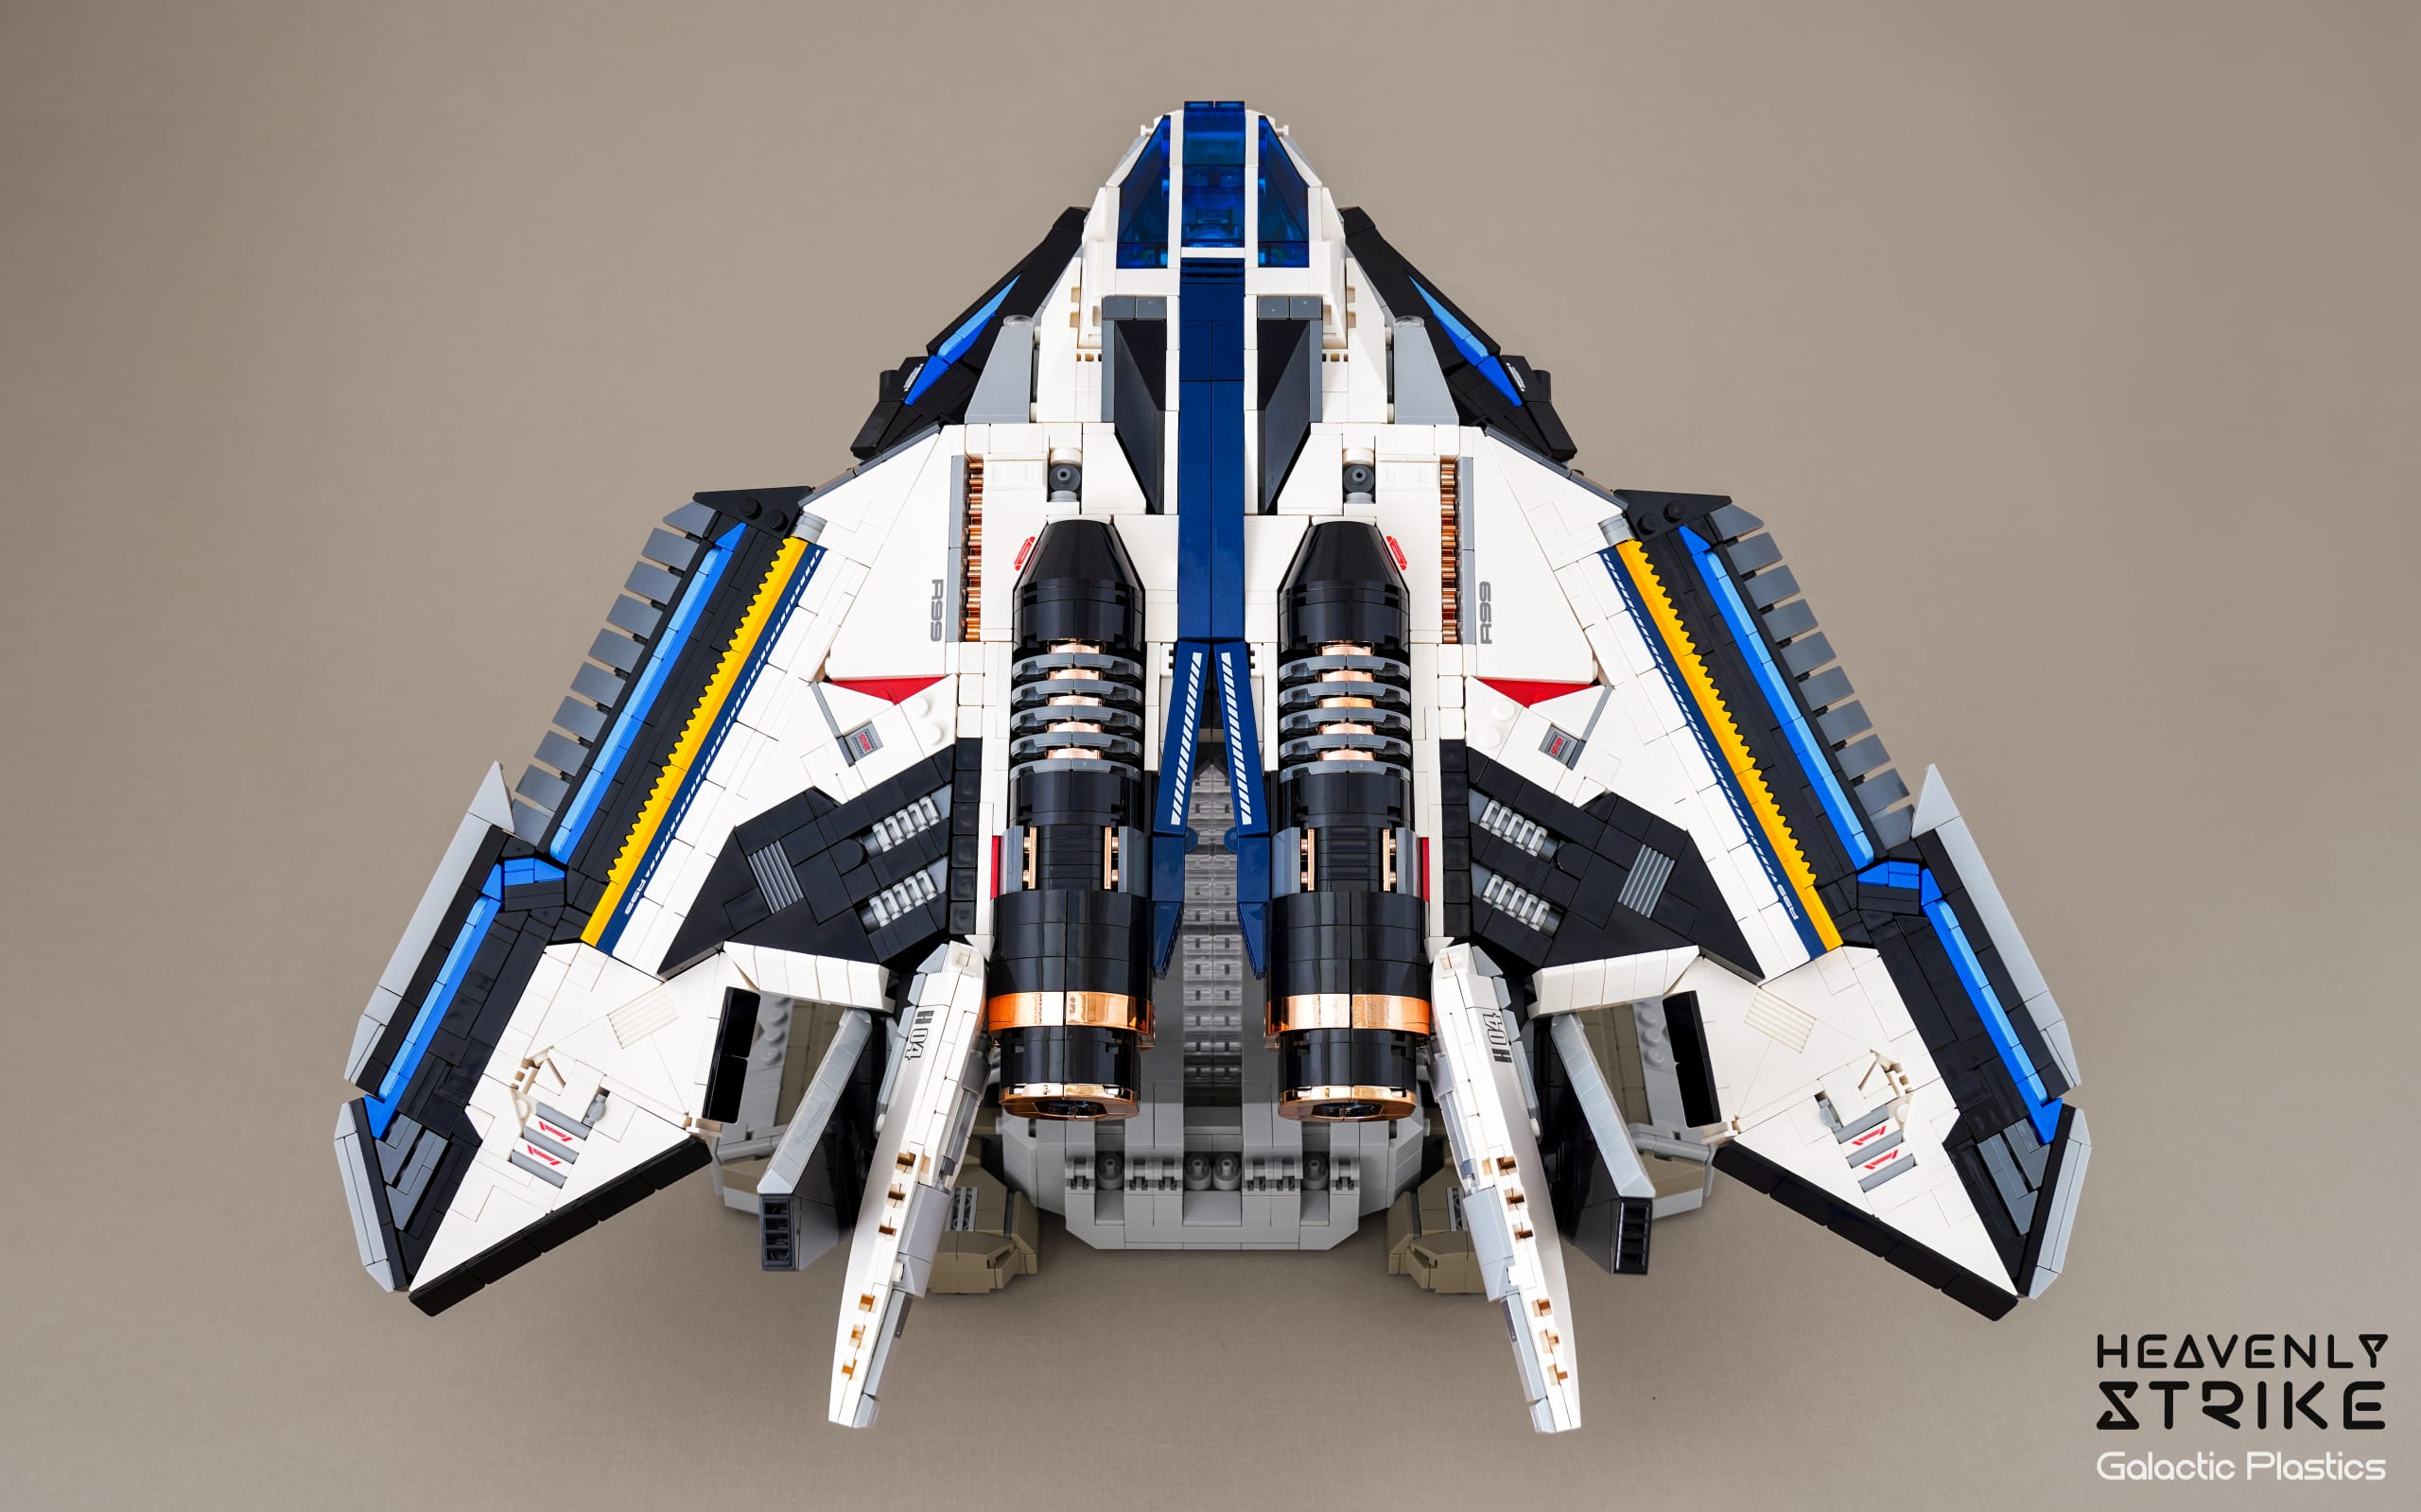 LEGO Heavenly Strike